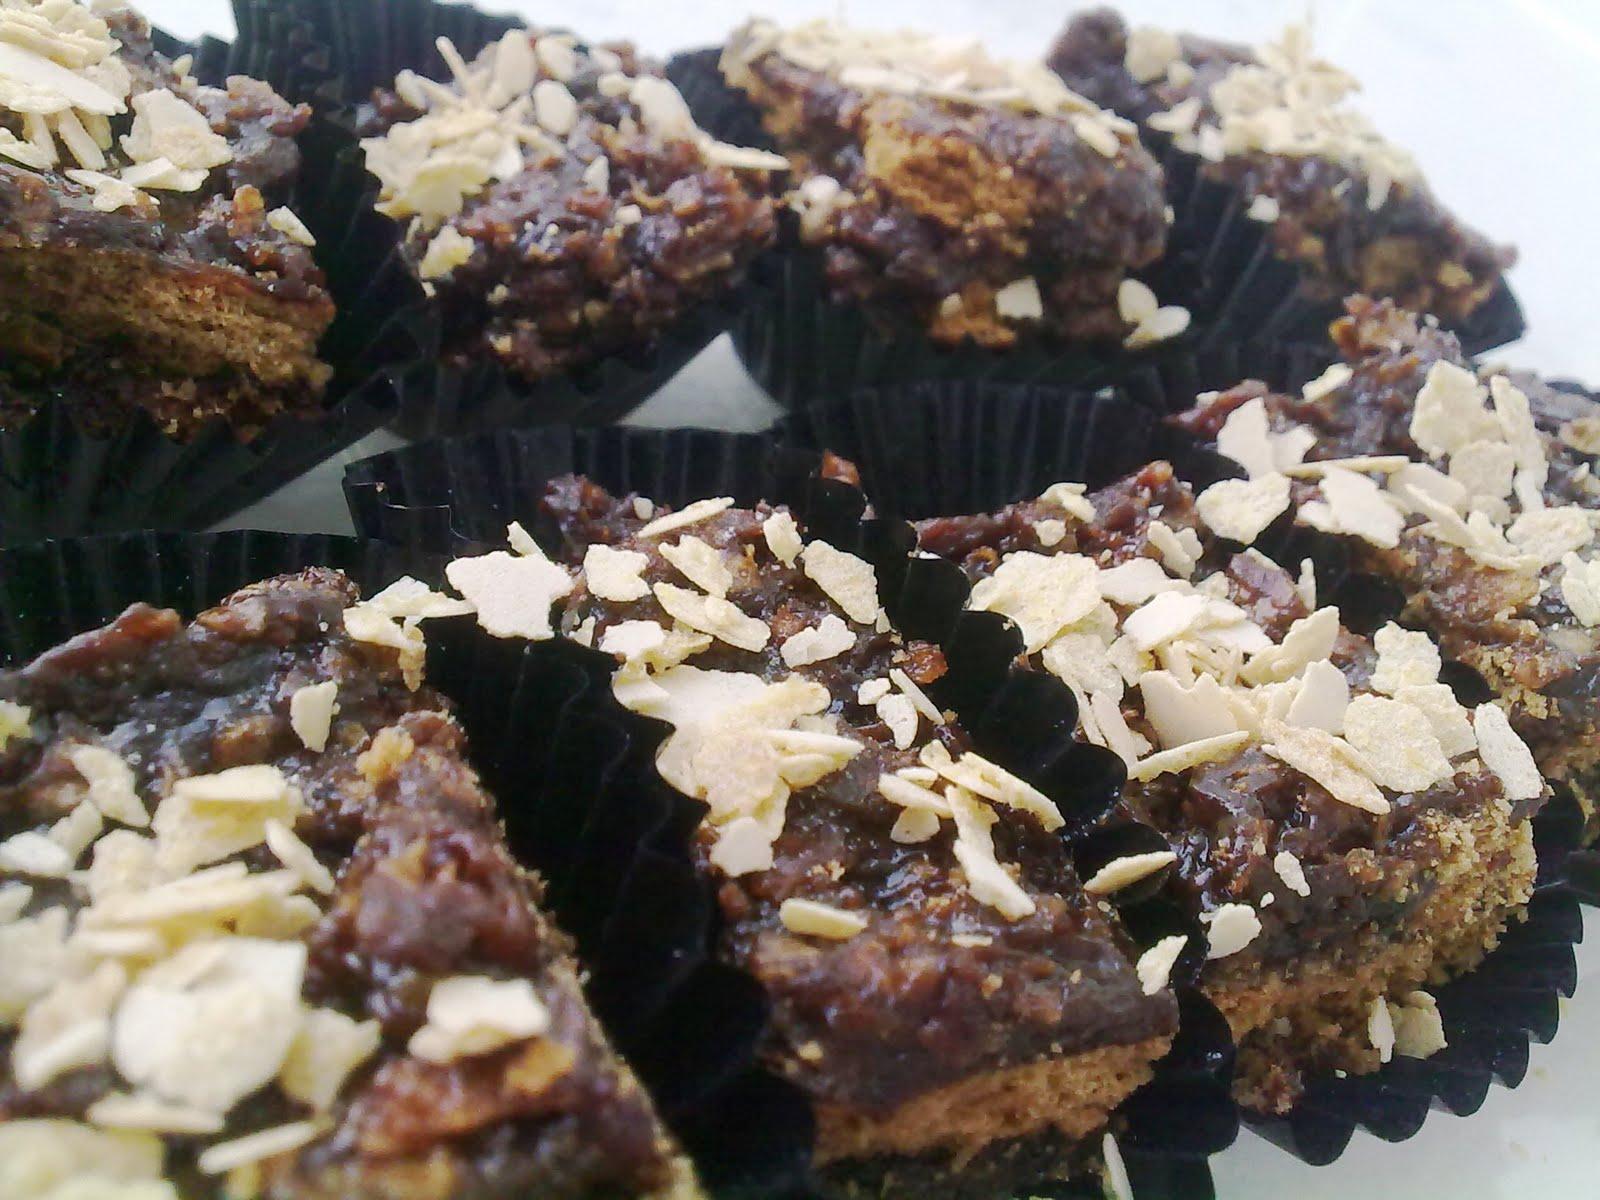 The Cupcakes' fairy: KEK BATIK VICO